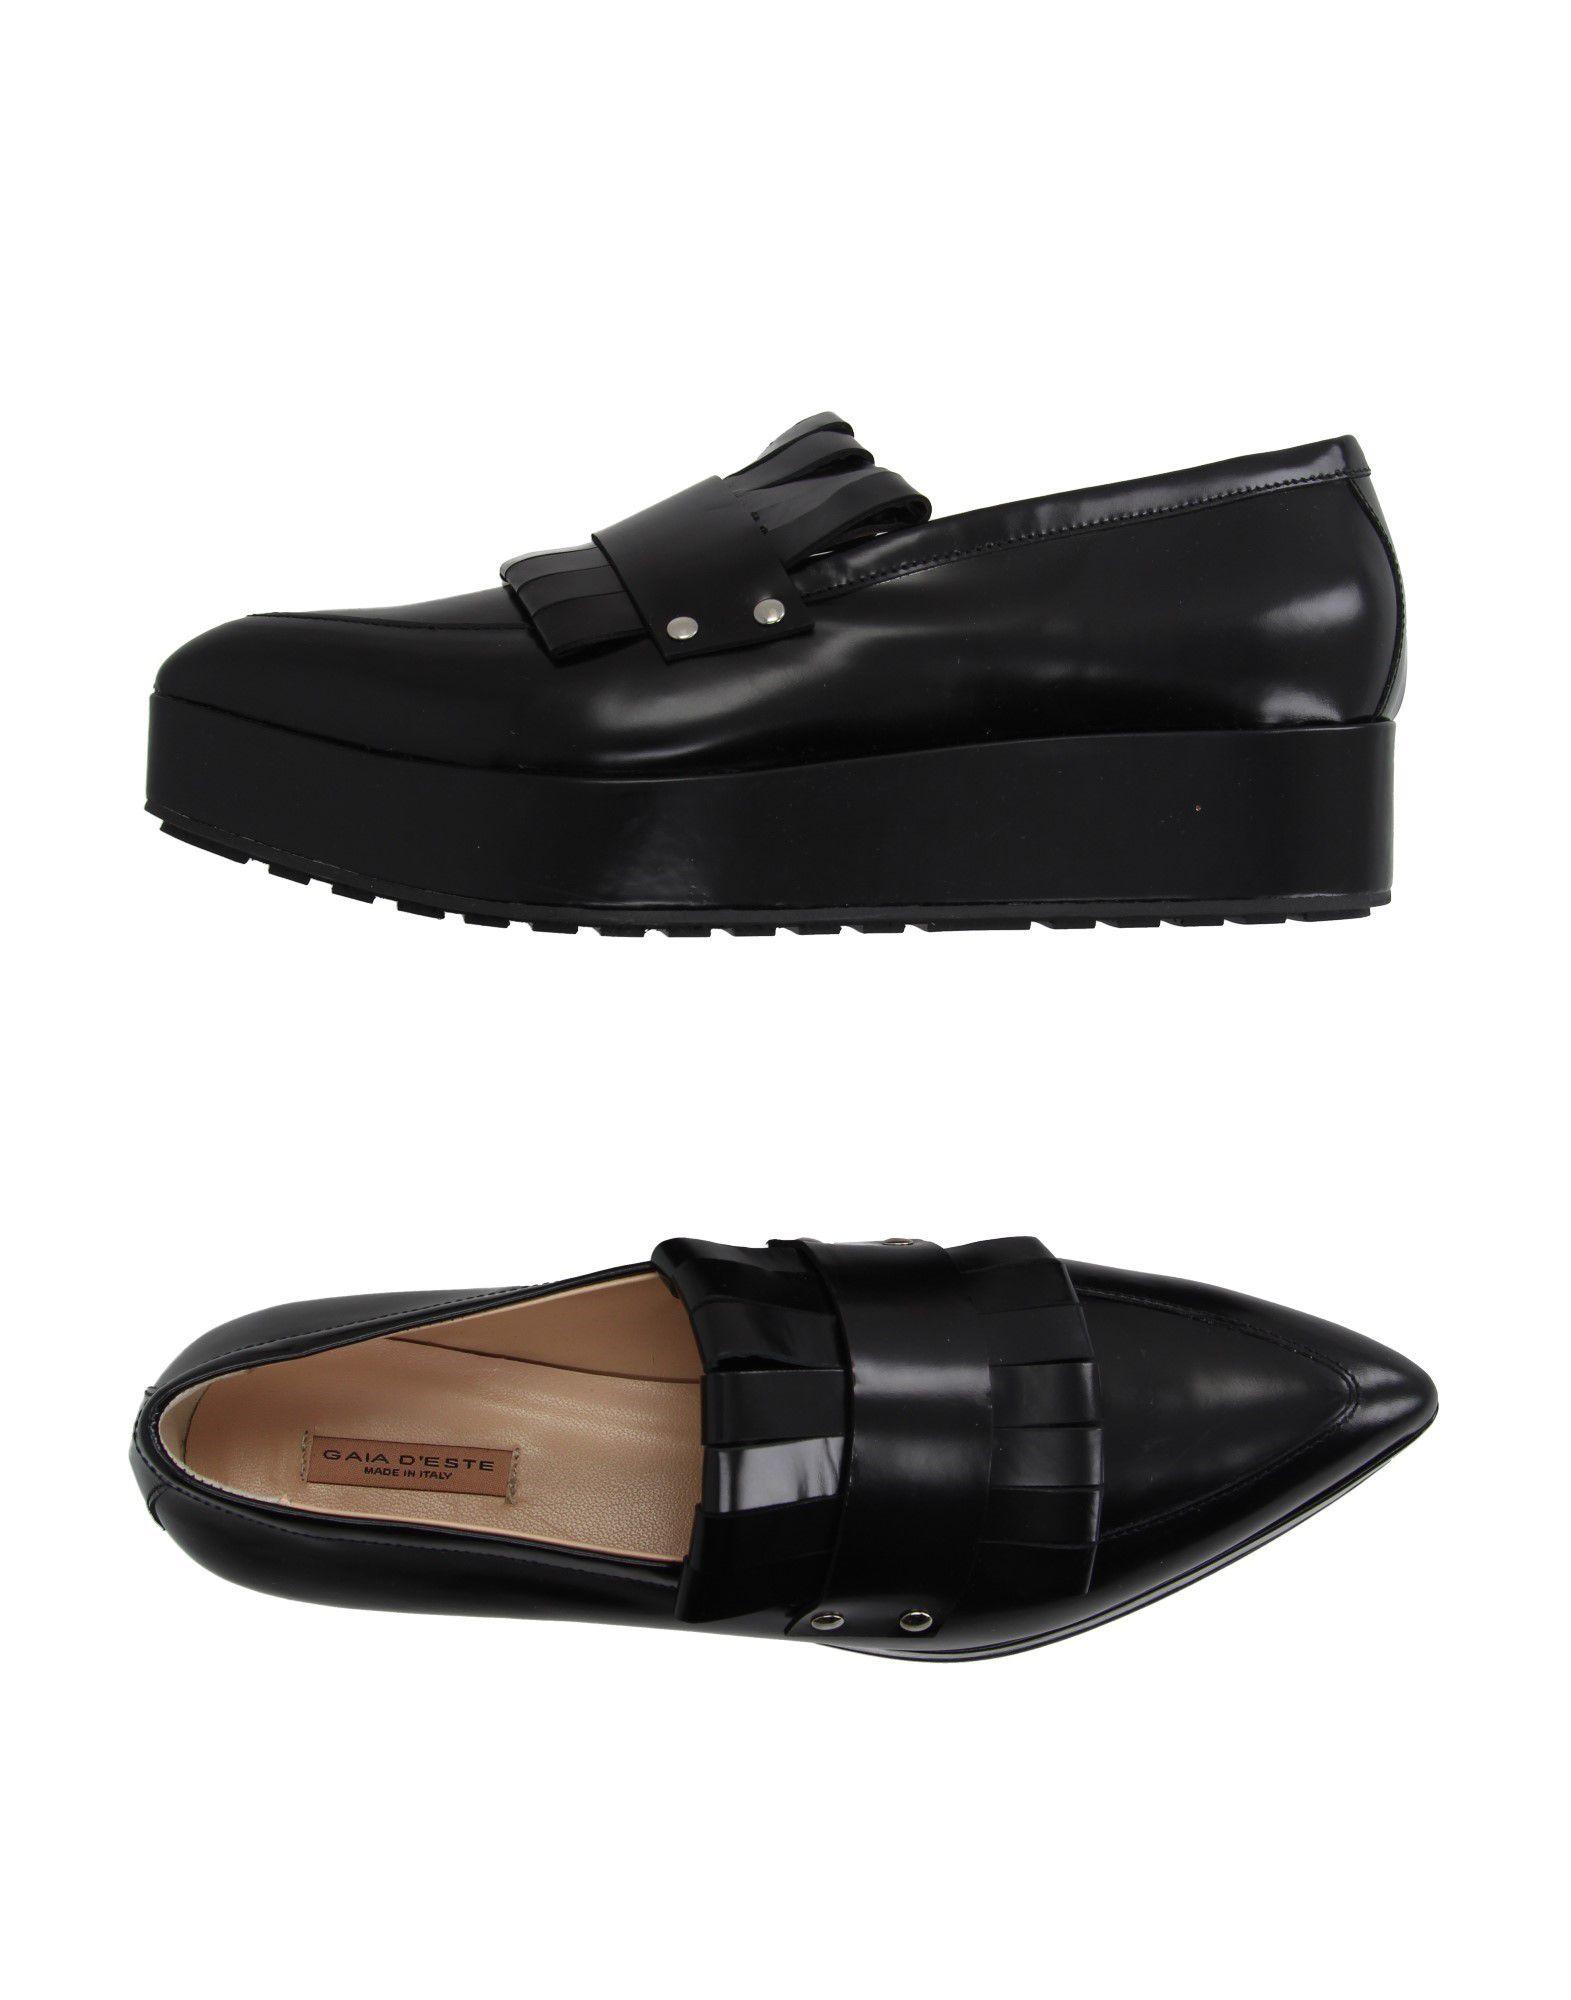 GAIA D'ESTE Loafers in Black